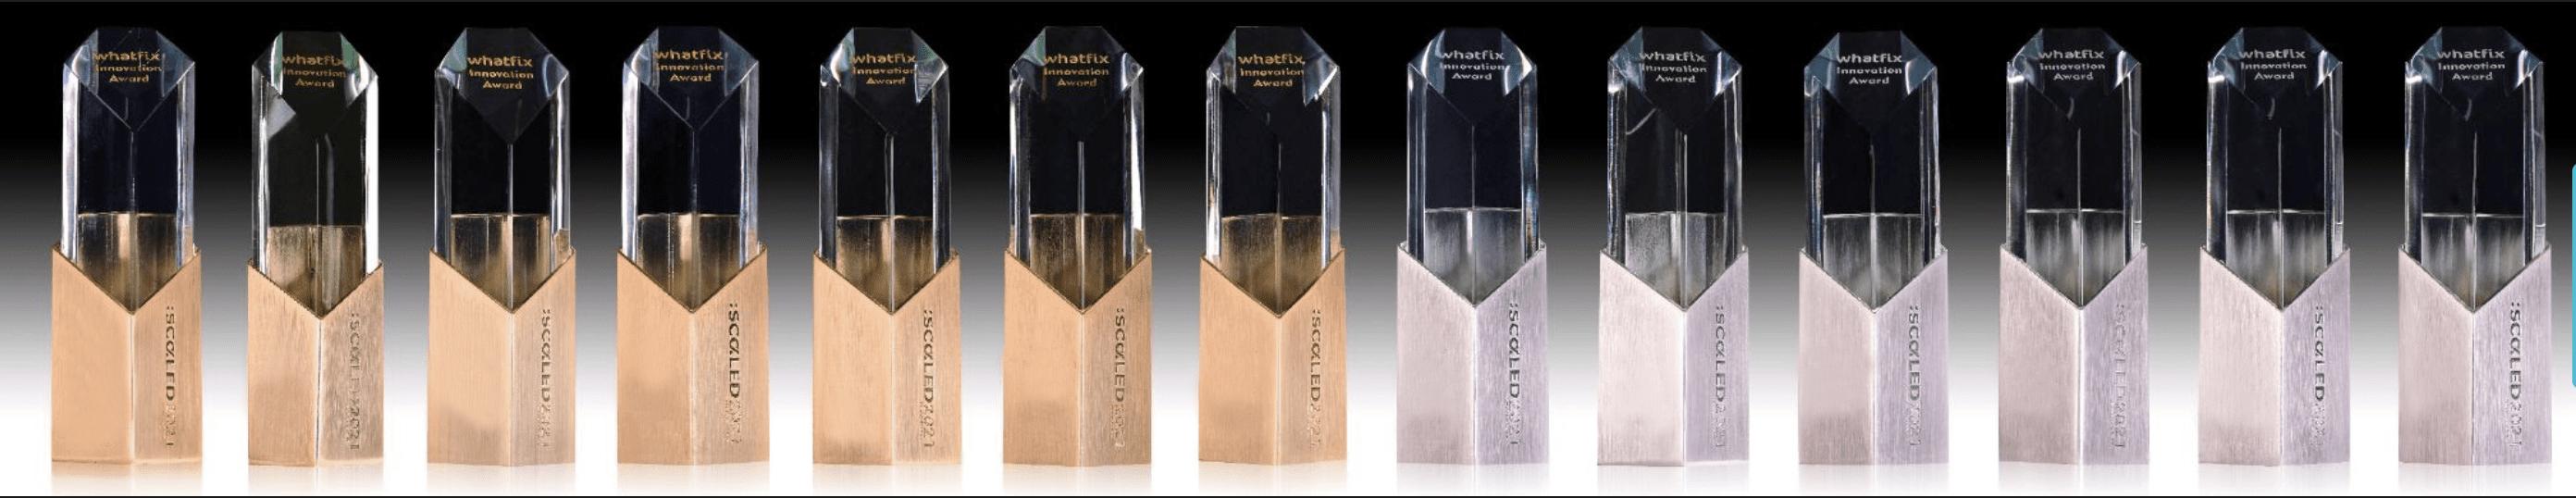 innovation-award-winners-trophies